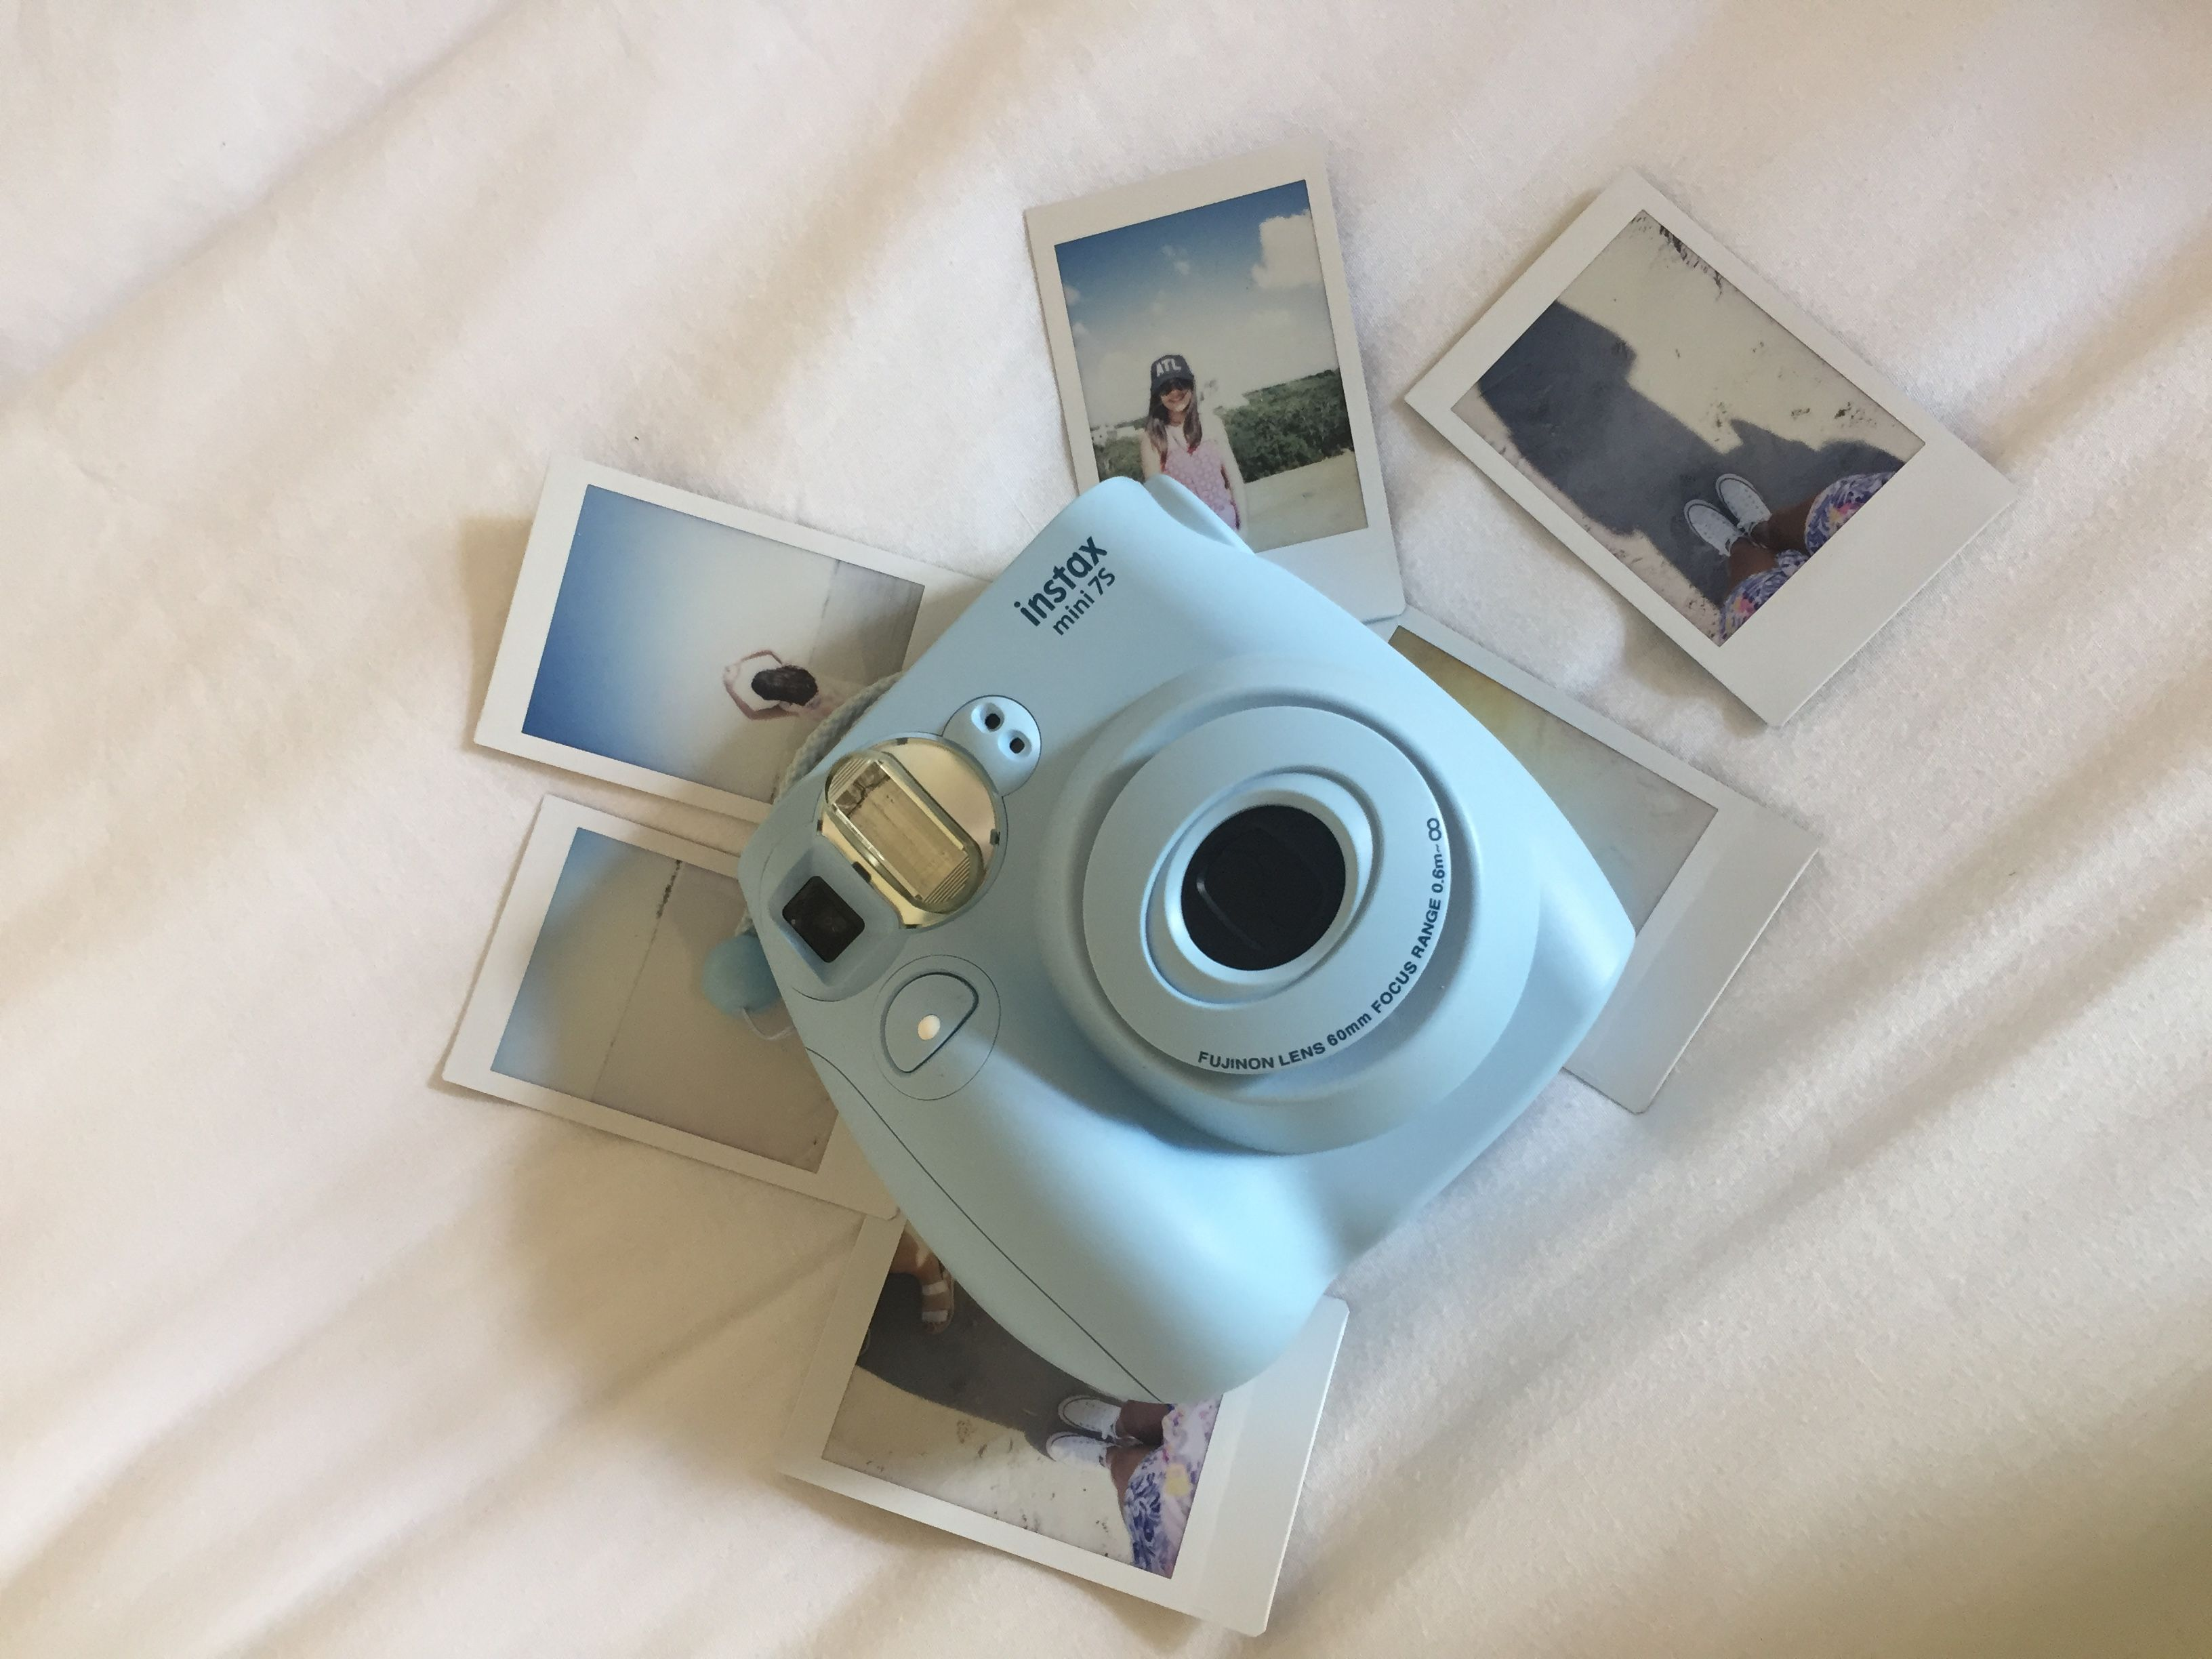 Polaroid Camera Urban Outfitters : Pin by clarisa lander on polaroid polaroid